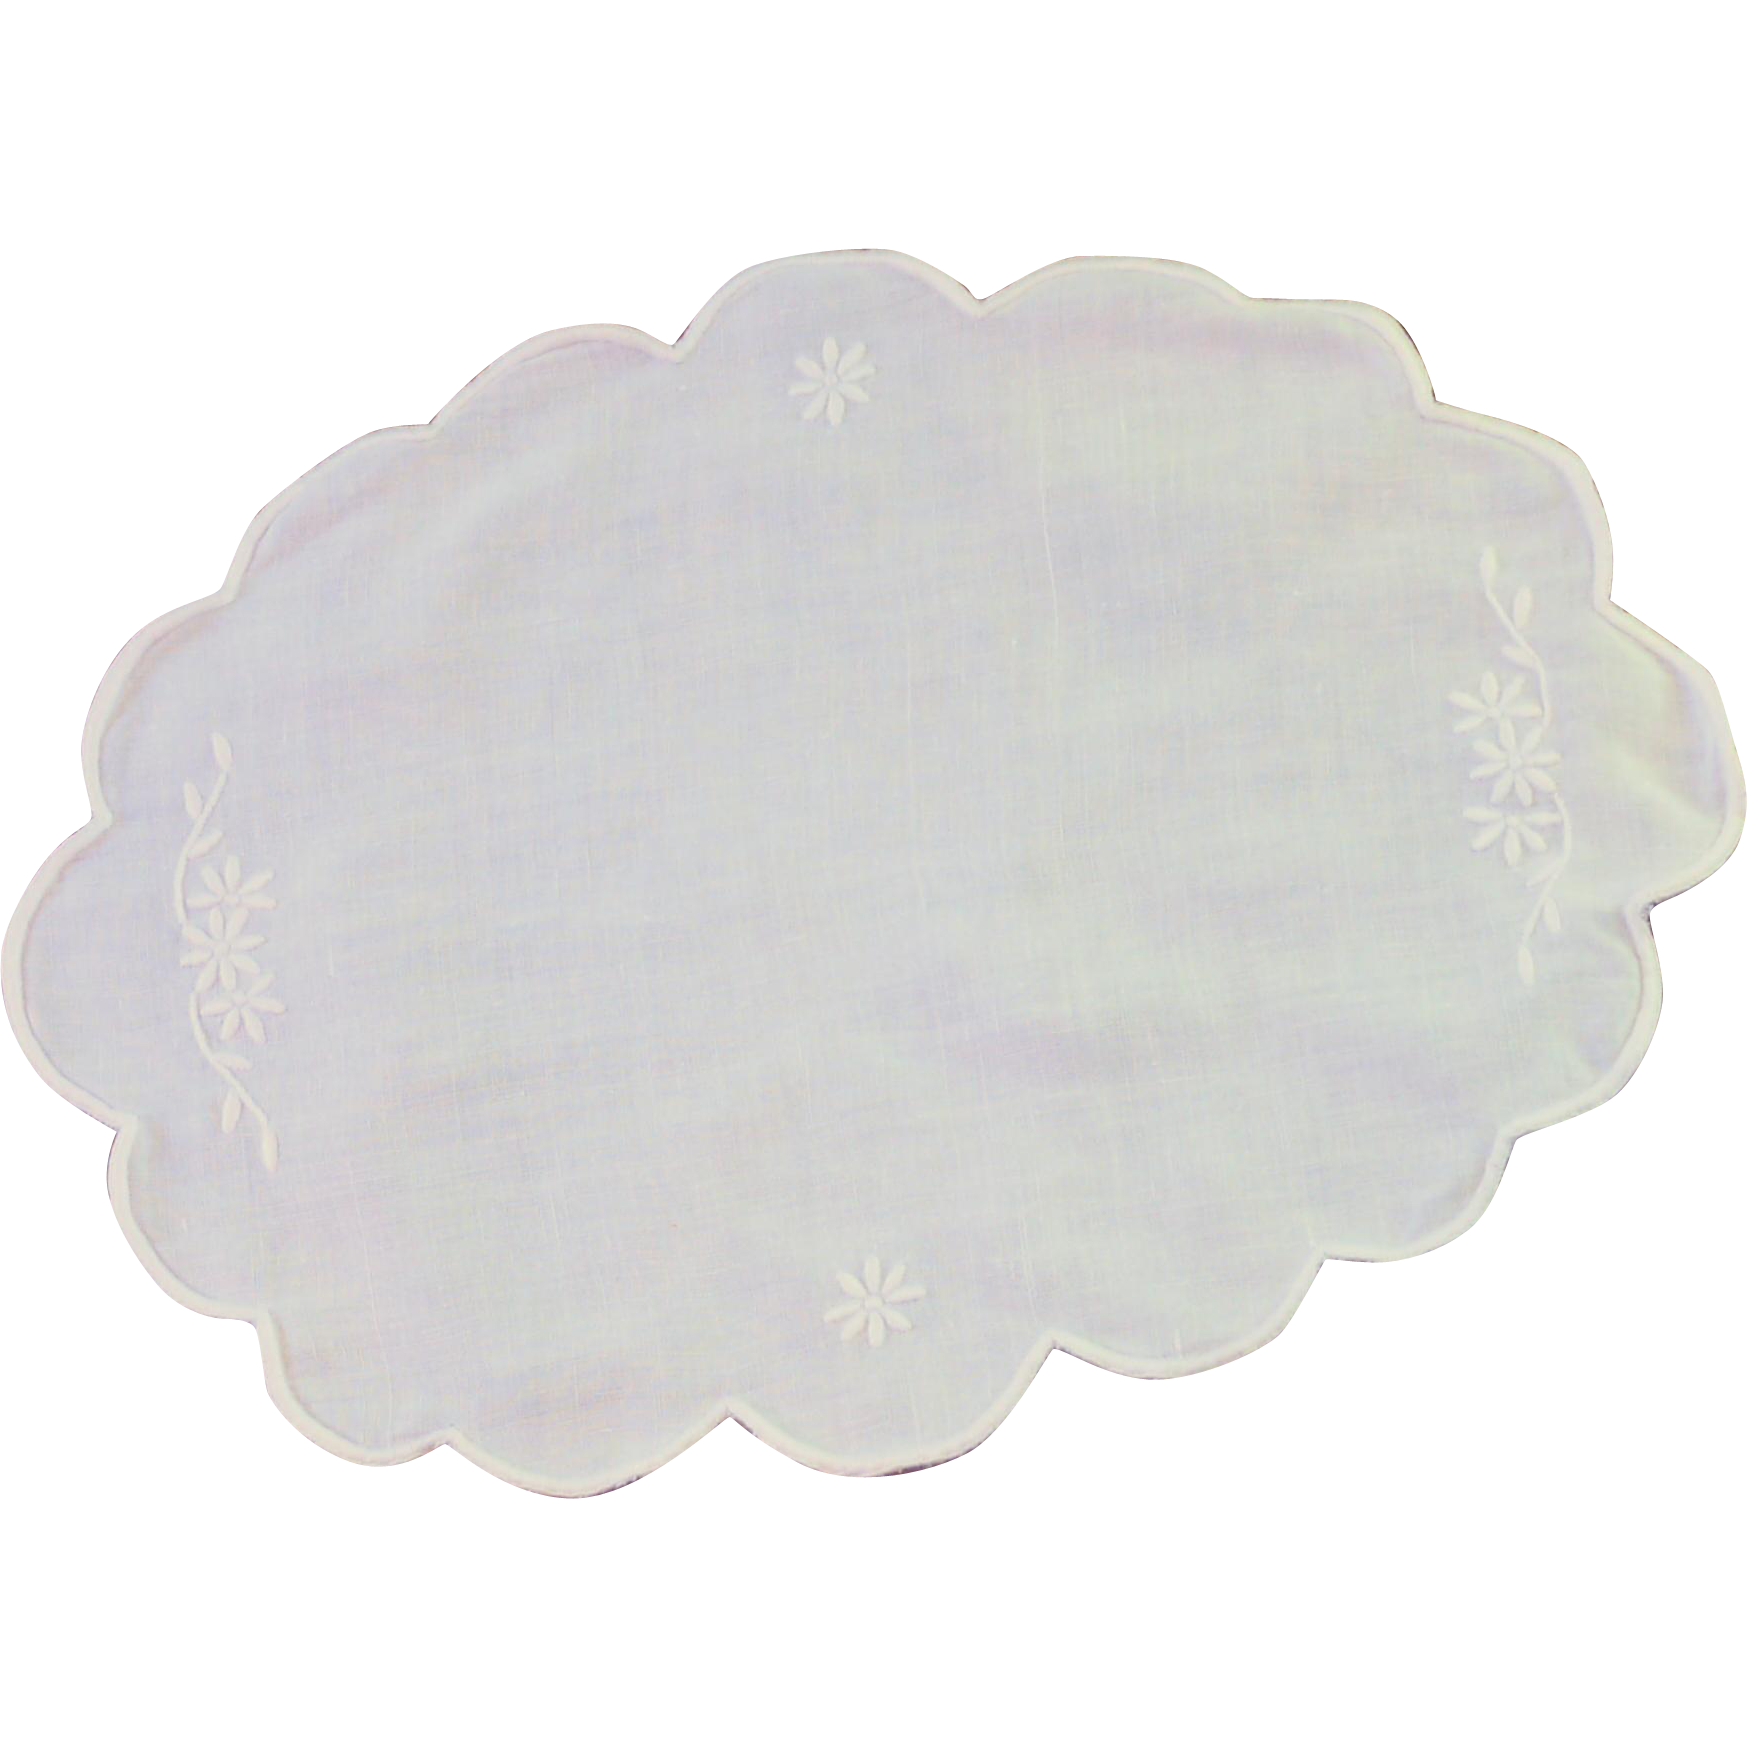 White Cotton Satin Stich Doily